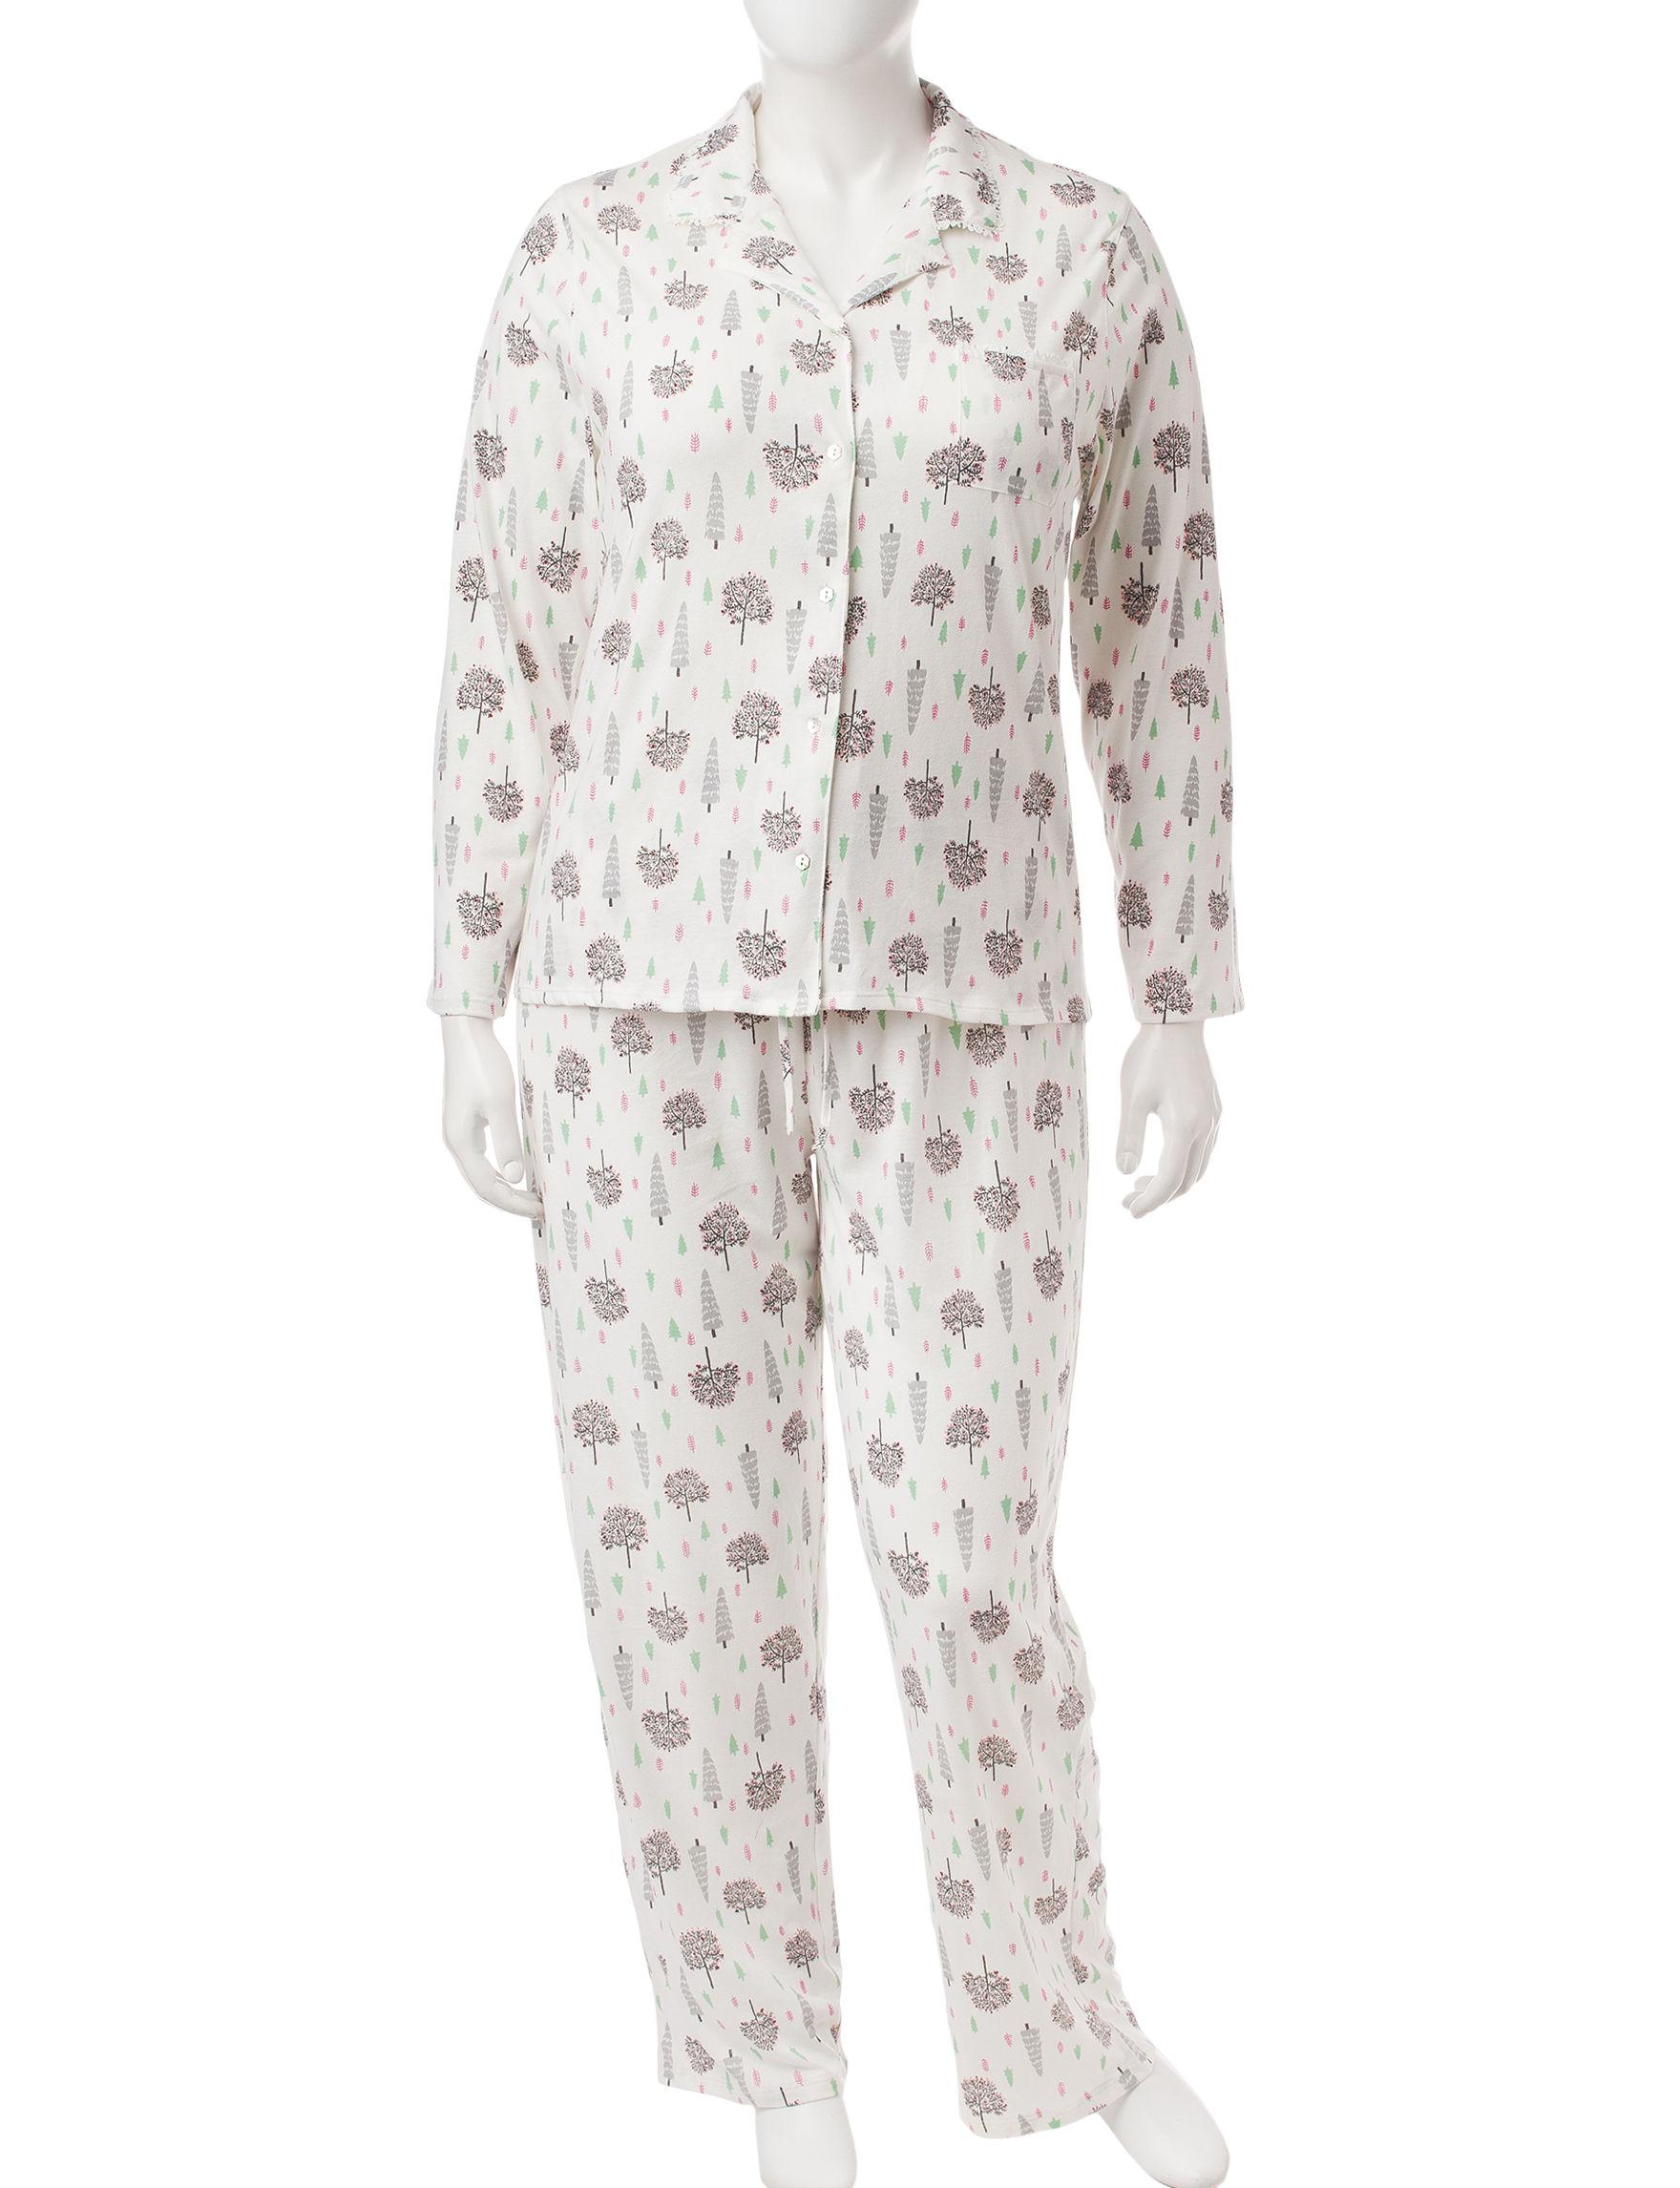 Aria Ivory Pajama Sets